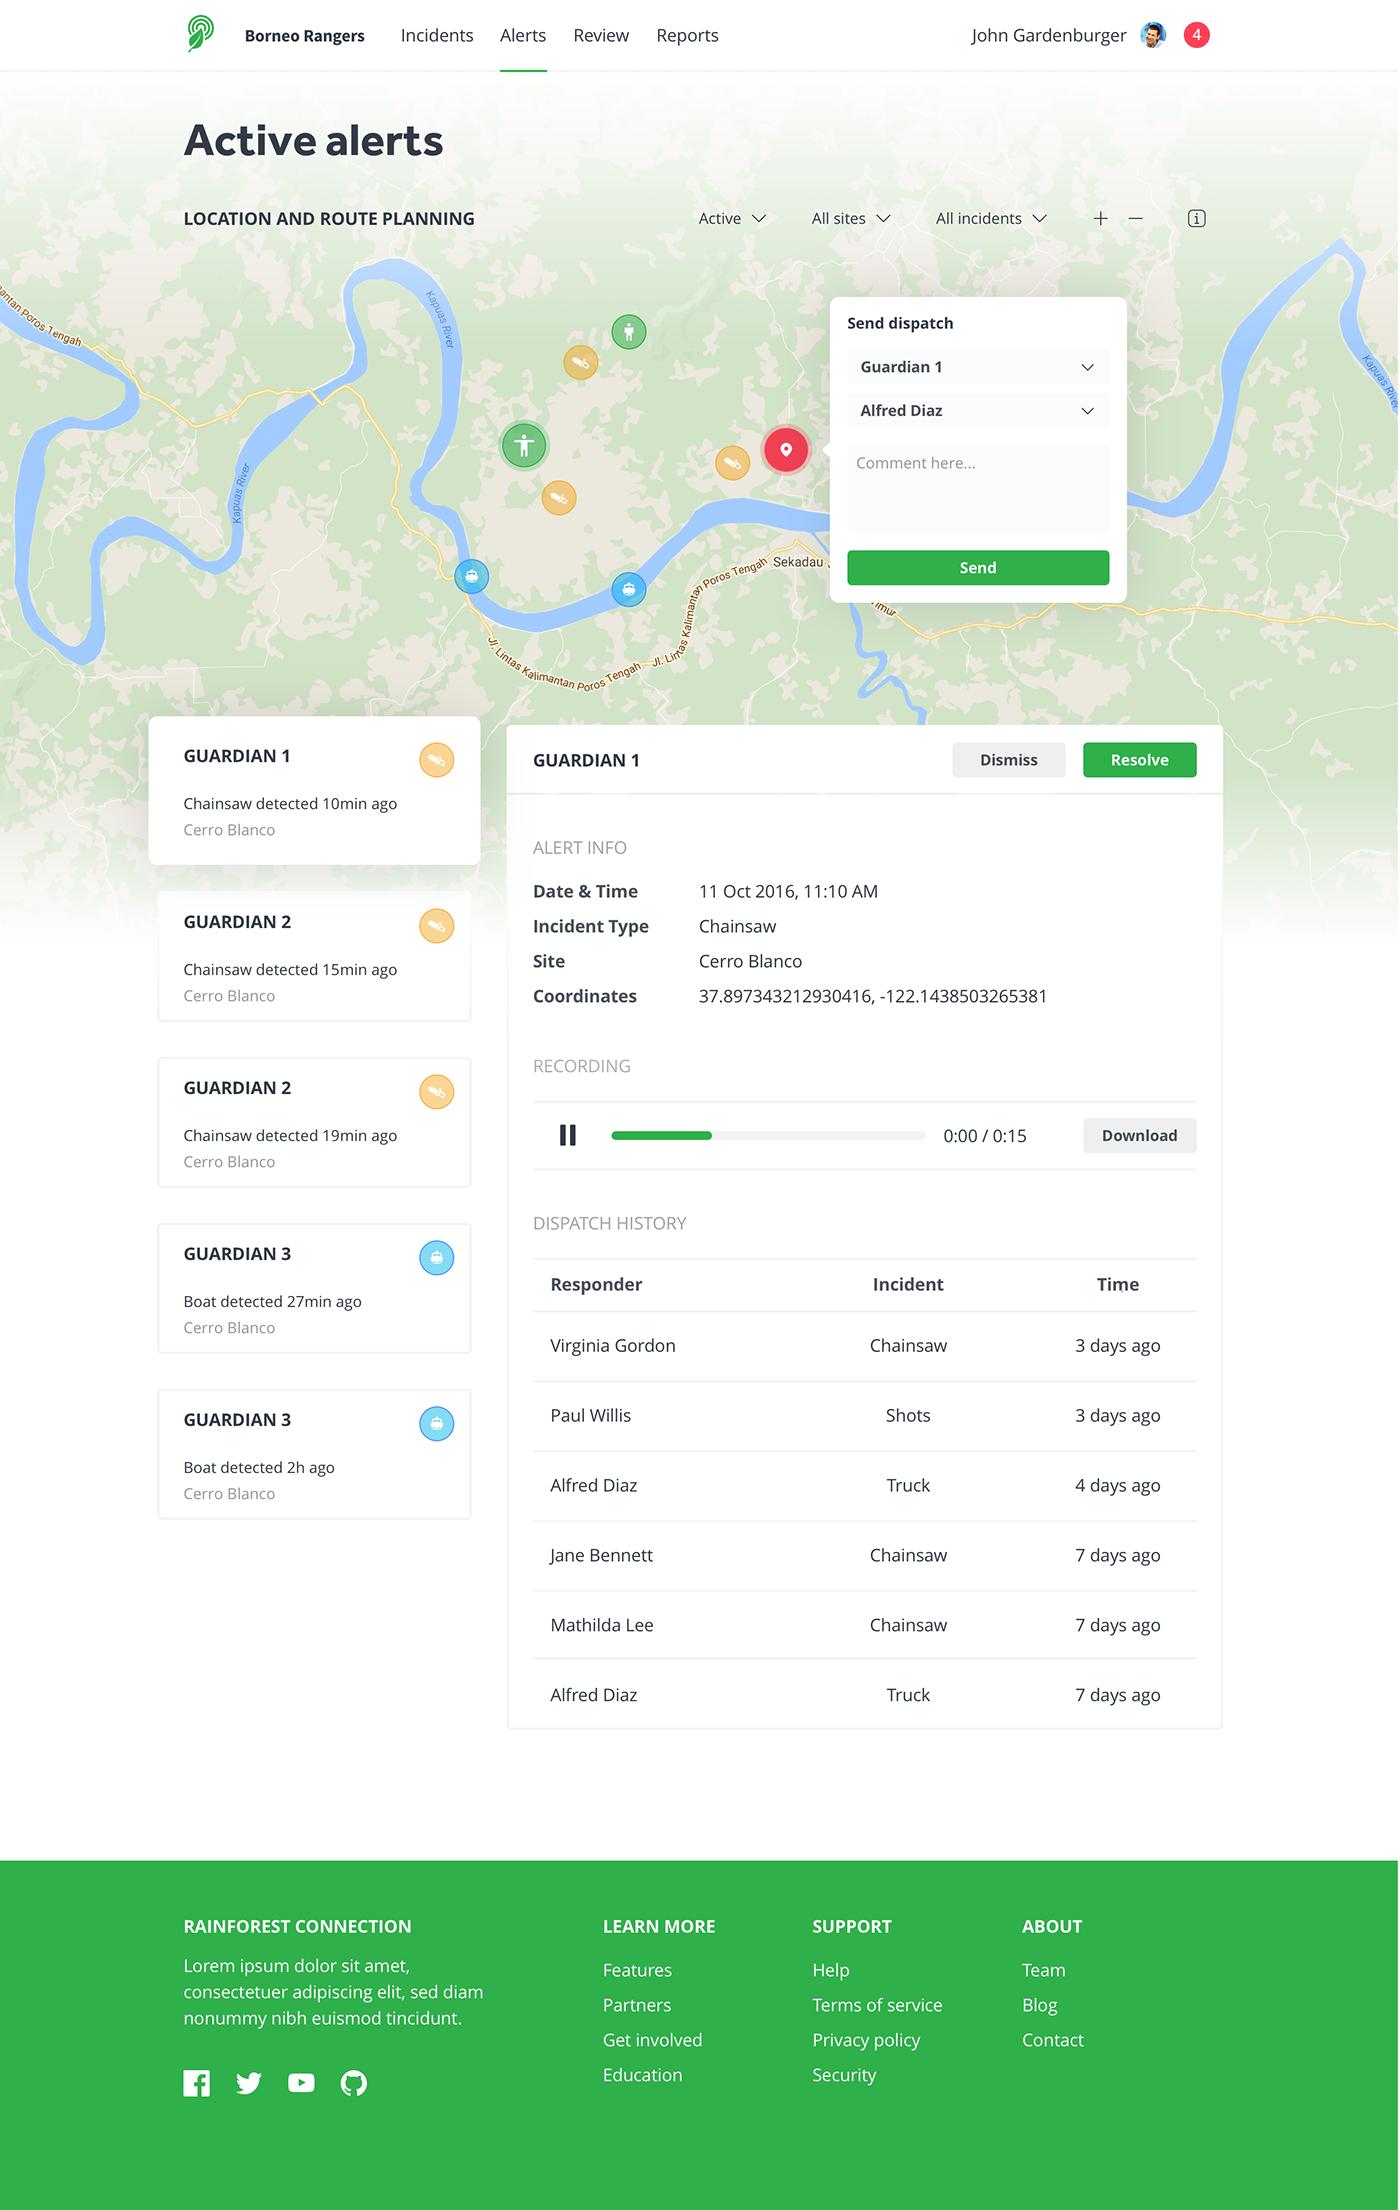 dashboard,Data,graph,chart,map,localization,stats,visualization